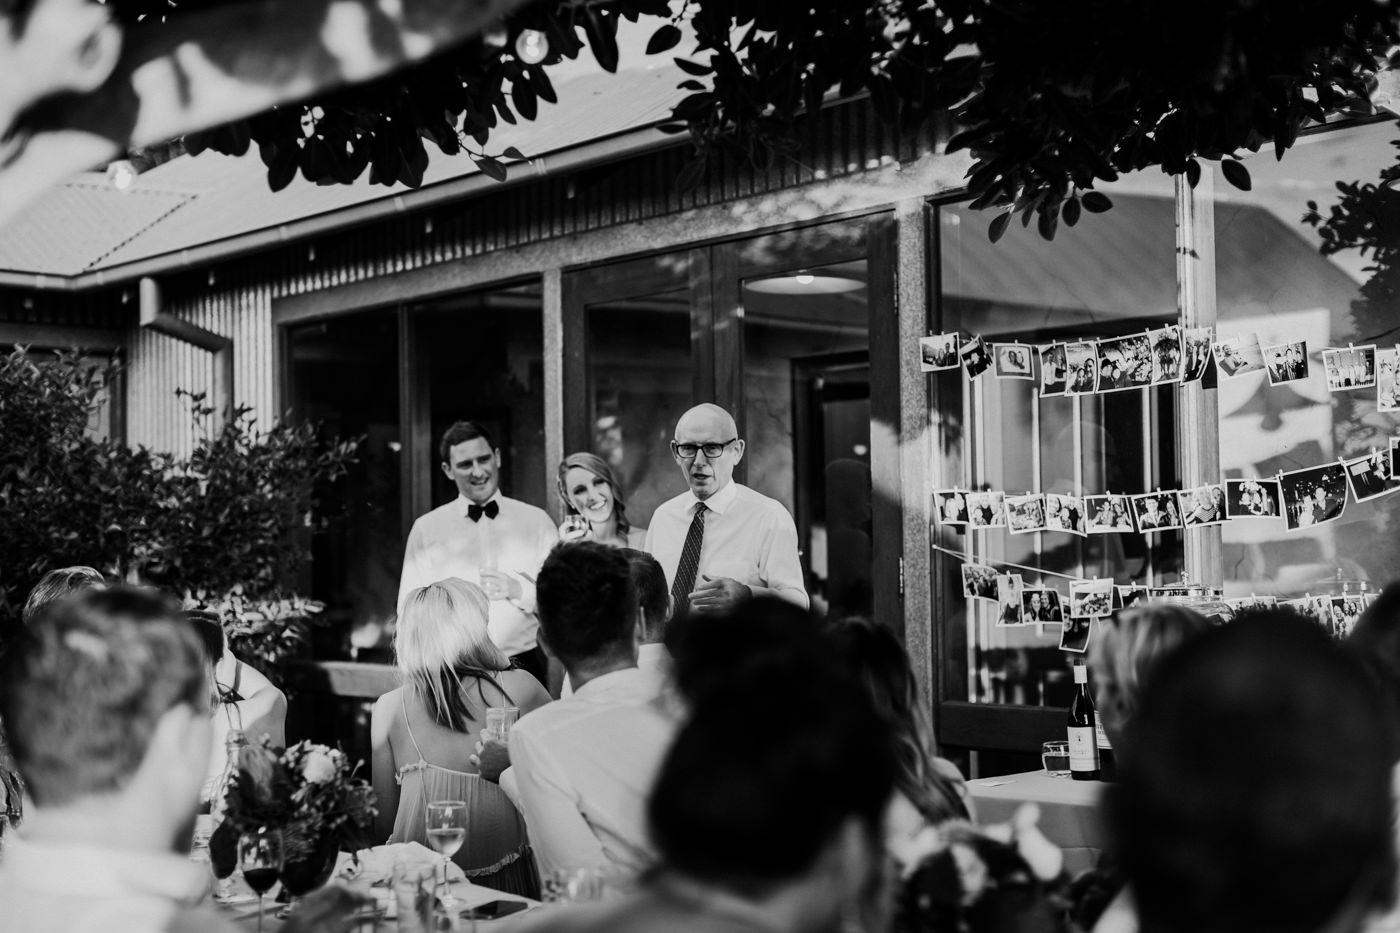 Anthony & Eliet - Wagga Wagga Wedding - Country NSW - Samantha Heather Photography-139.jpg